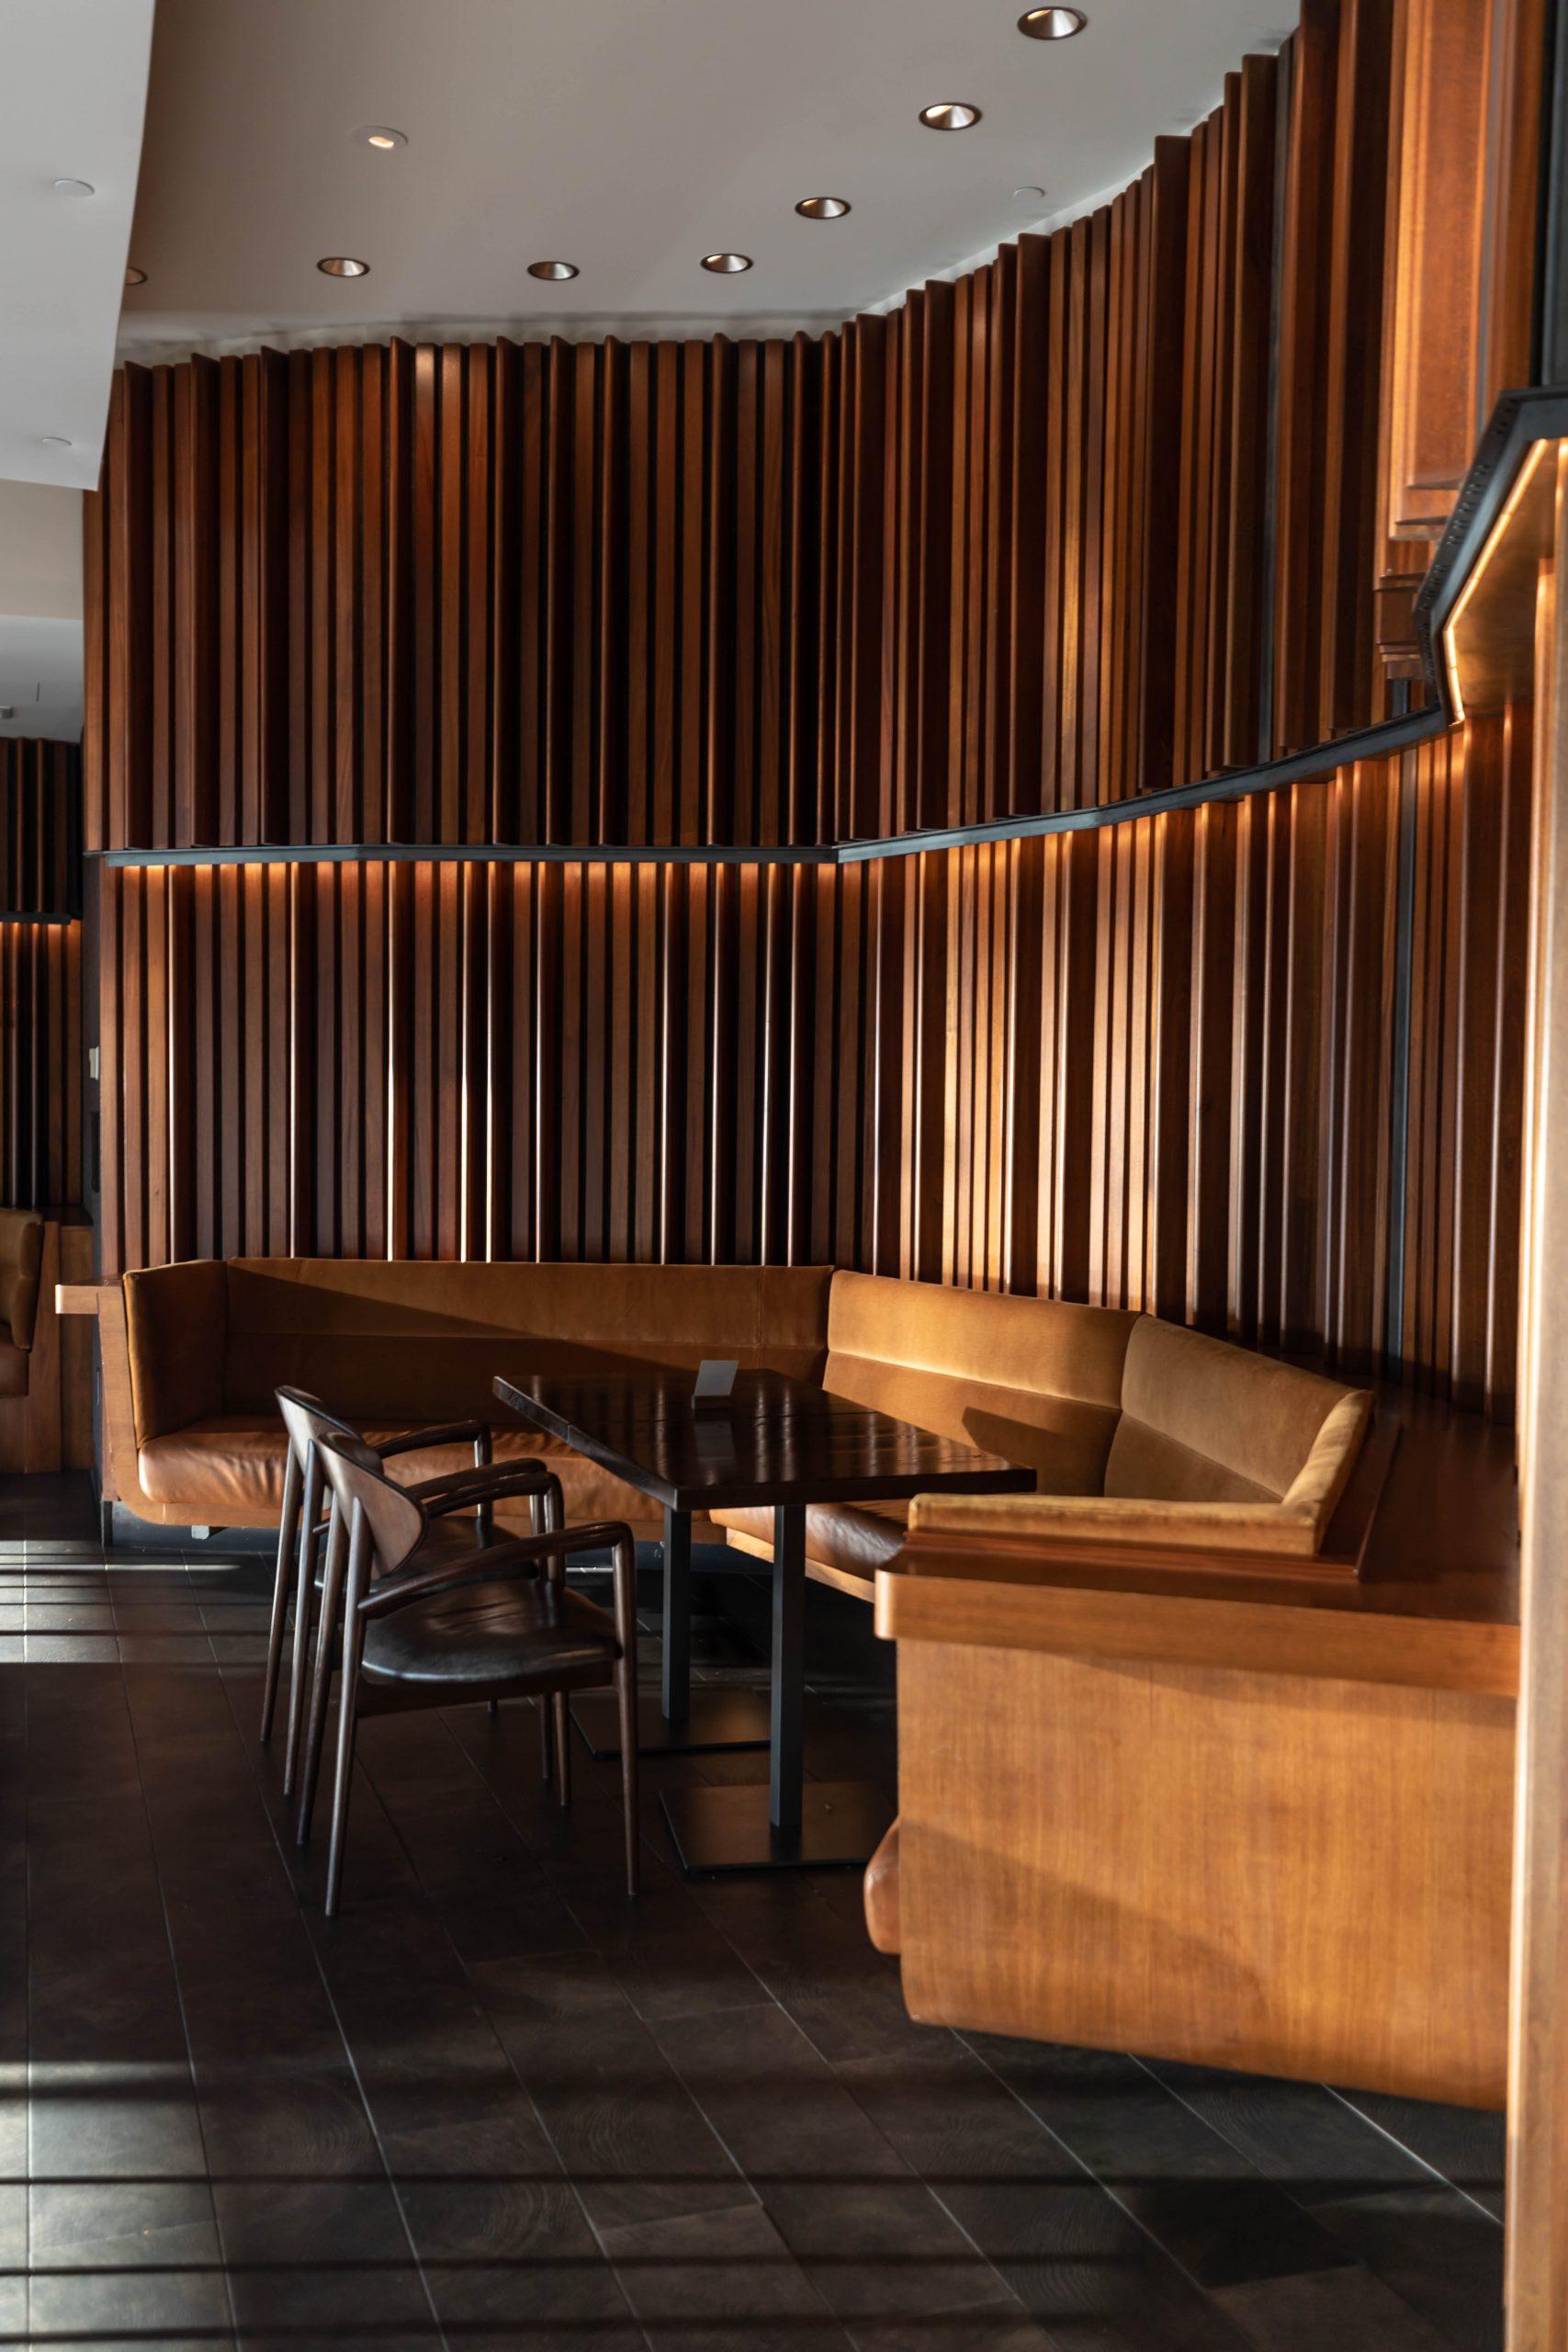 Goldfinch Tavern Inside Four Seasons Hotel Seattle Washington by Annie Fairfax